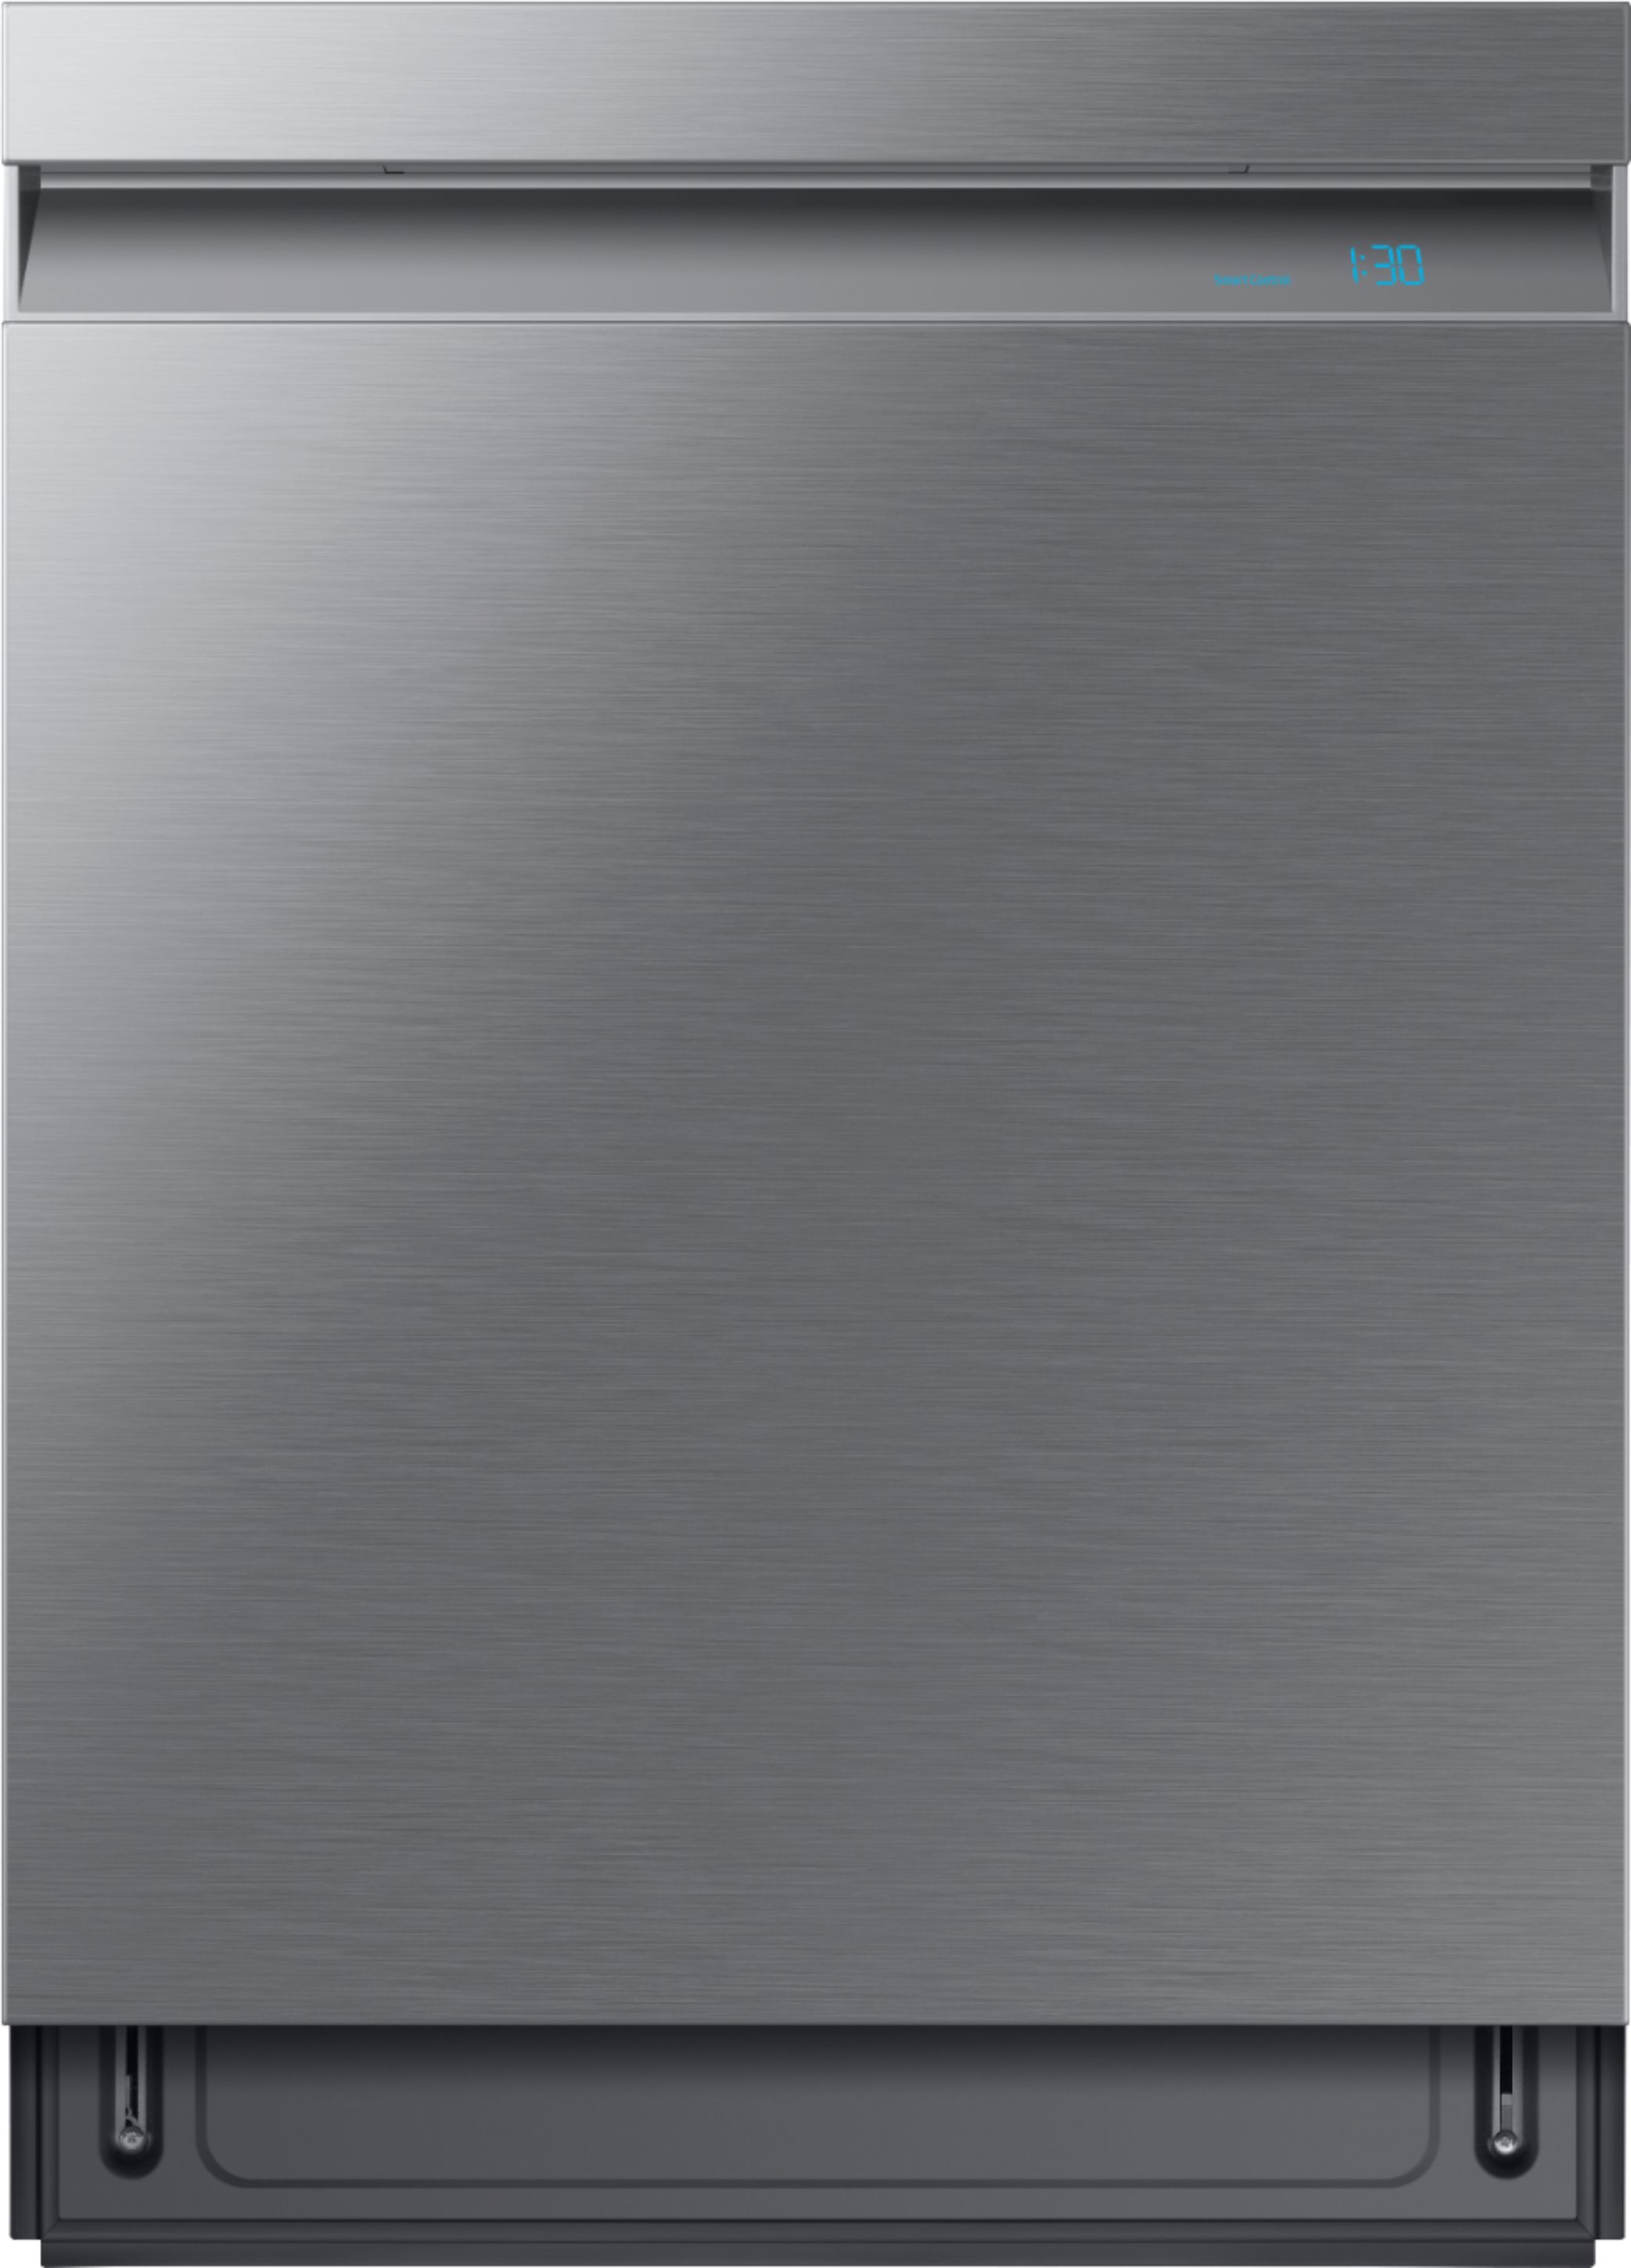 Samsung Dishwasher Kick Plate : samsung, dishwasher, plate, Samsung, Linear, Control, Built-In, Dishwasher, AutoRelease, Fingerprint, Resistant, Stainless, Steel, DW80R9950US